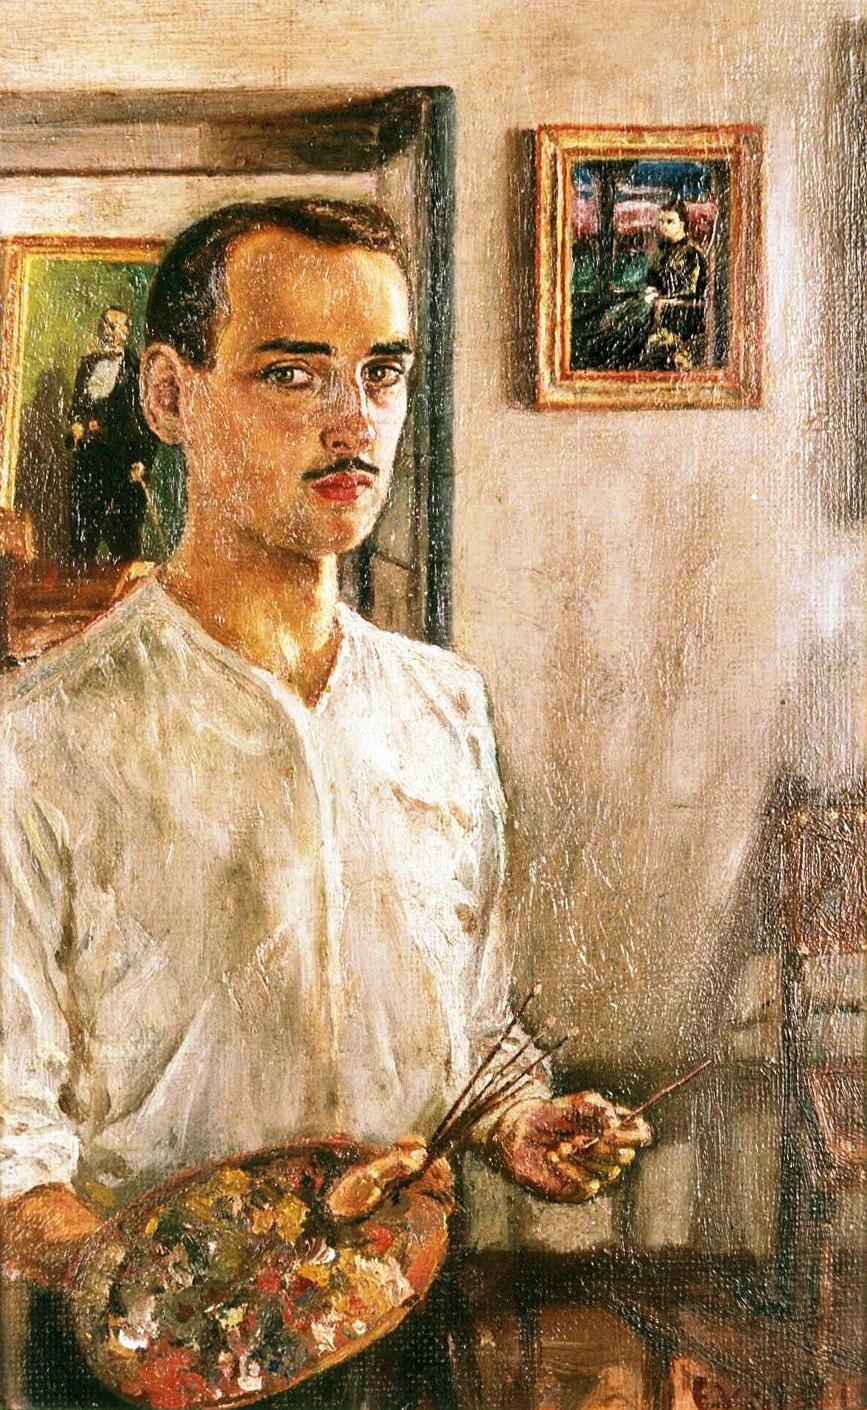 Enrique Vidal Abascal, Pintor español, Retratos de  Enrique Vidal Abascal, Pintores Realistas Españoles, Galería de retratos figurativos, Autorretrato de  Enrique Vidal Abascal